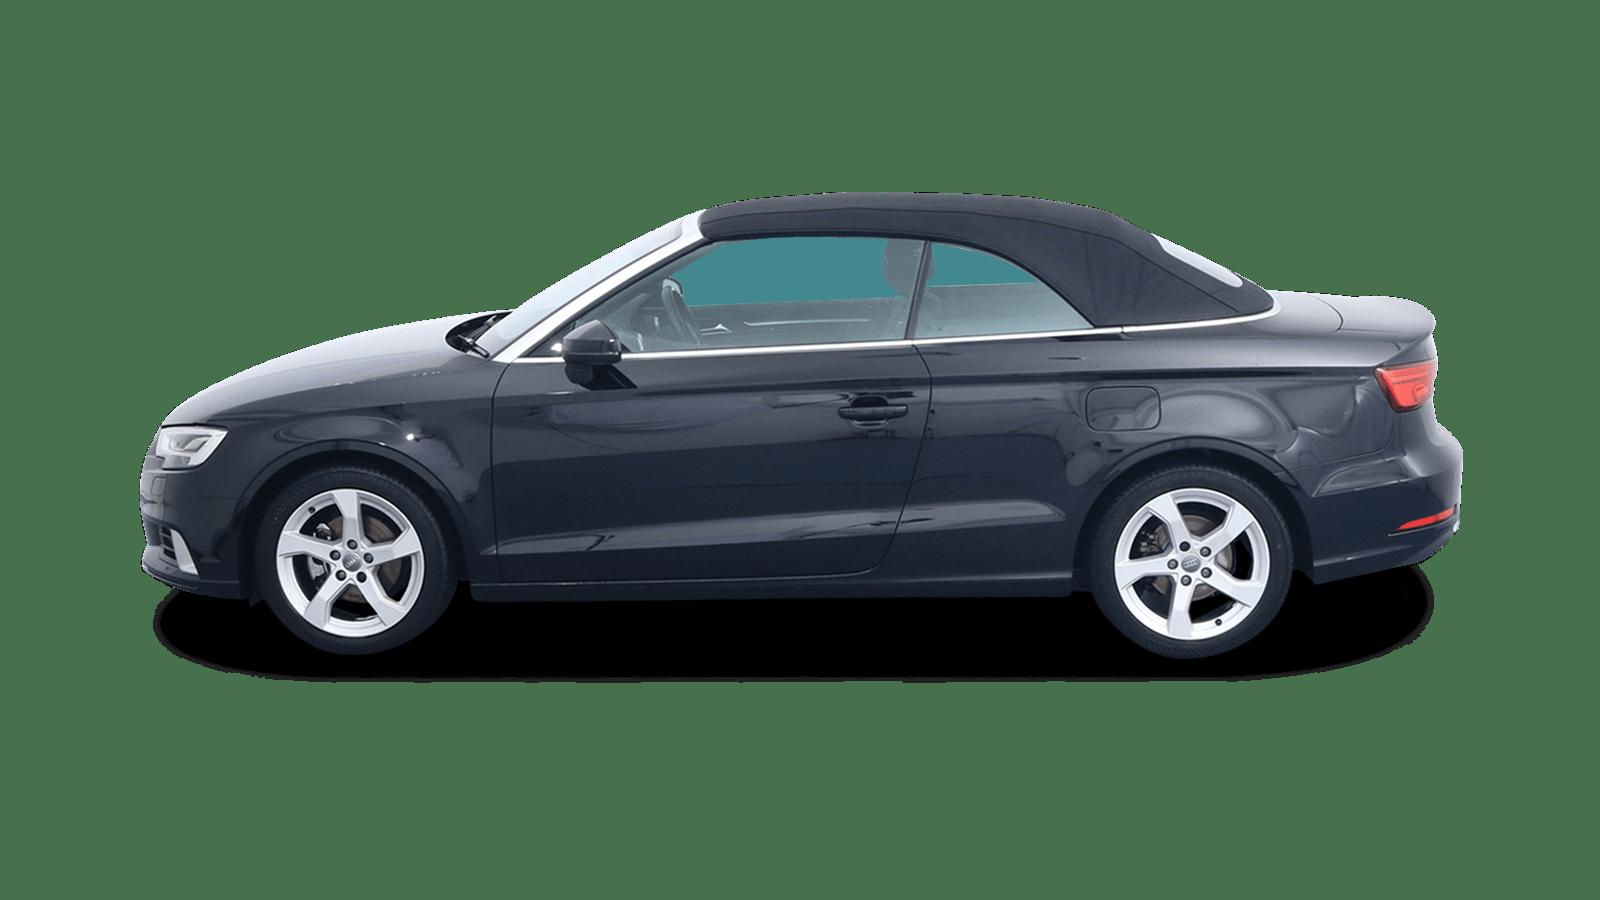 Audi A3 Cabriolet Schwarz rückansicht - Clyde Auto-Abo